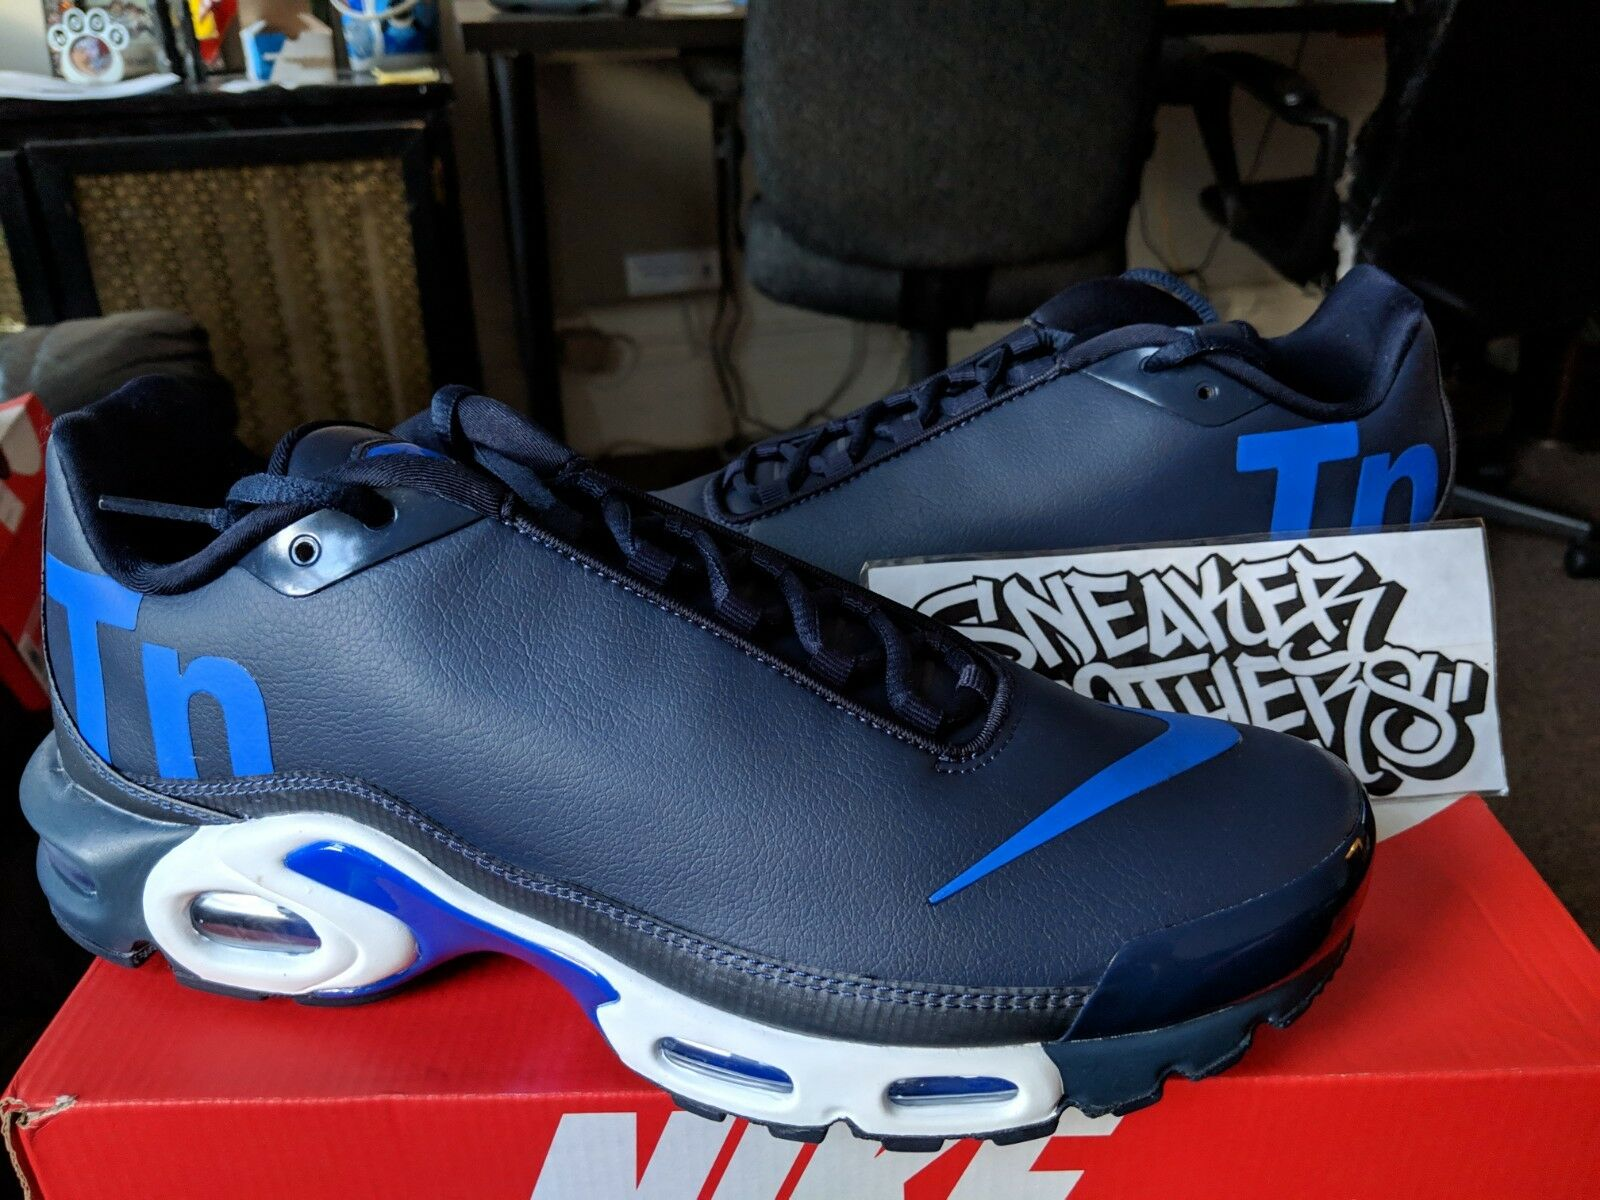 b882fed0654 Nike Air Max Plus Plus Plus TN Mercurial Navy Royal bluee White Running  Men s AQ1088-